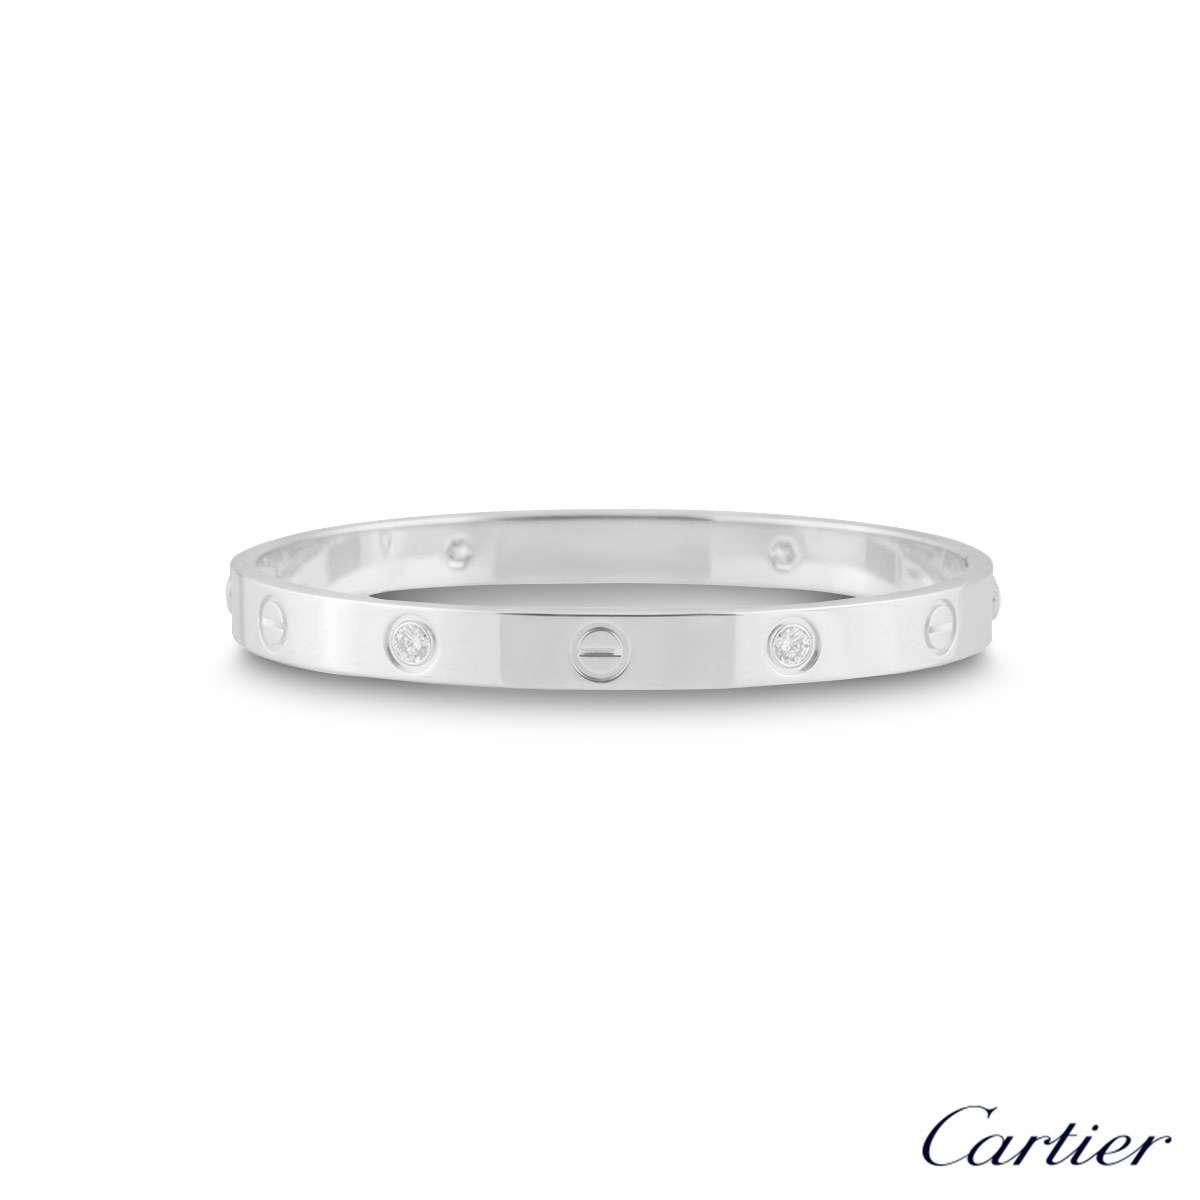 Cartier White Gold Half Diamond Love BraceletSize 18B6035818